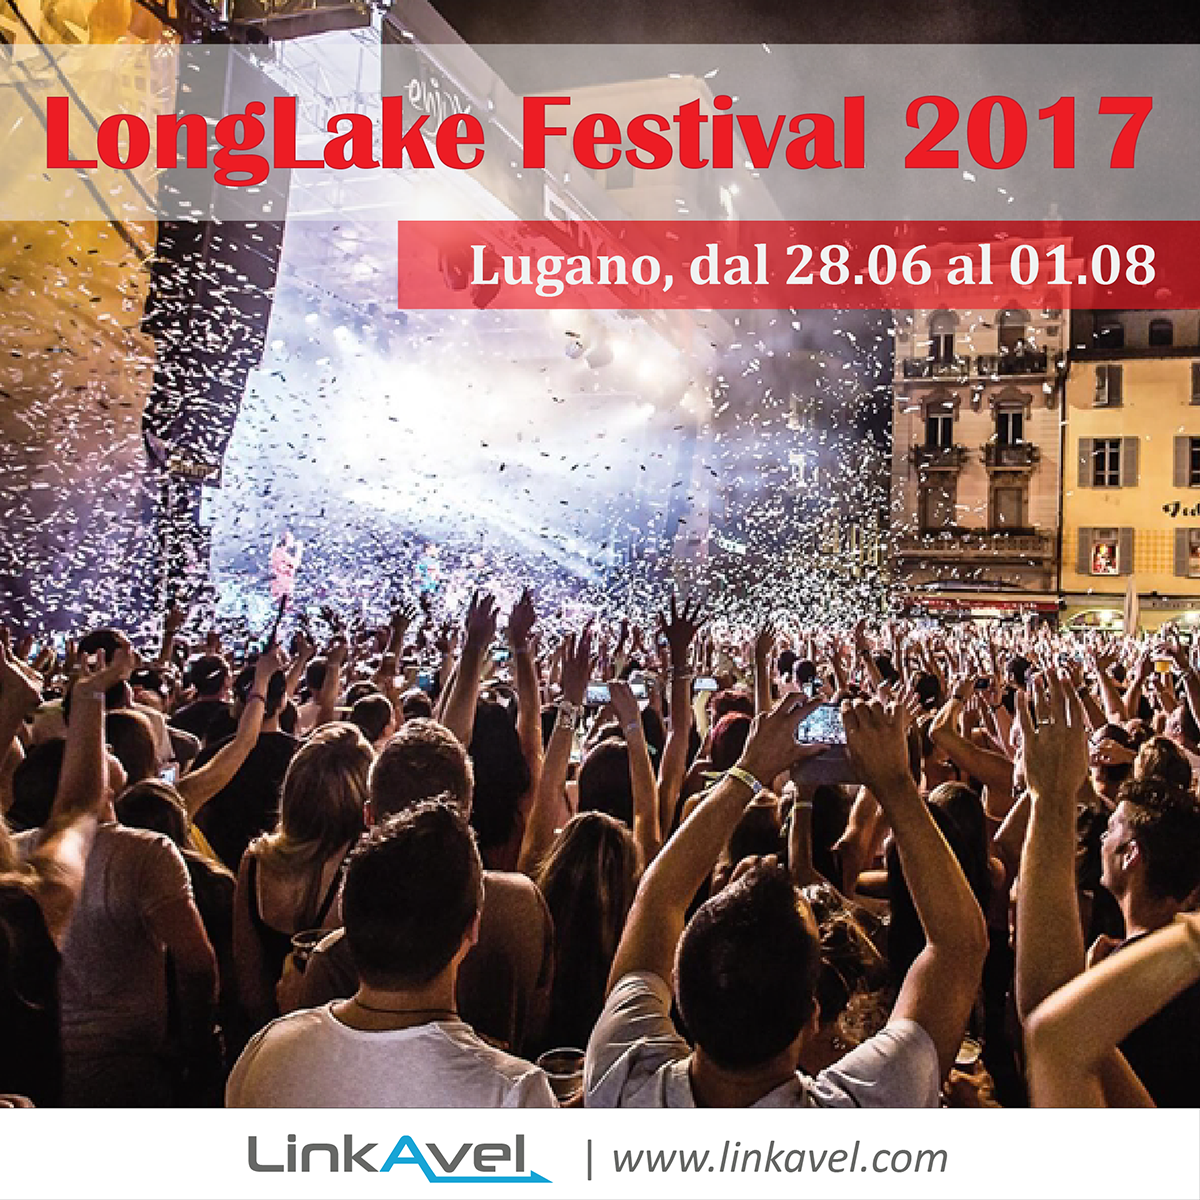 LongLake Festival Lugano summer 2017